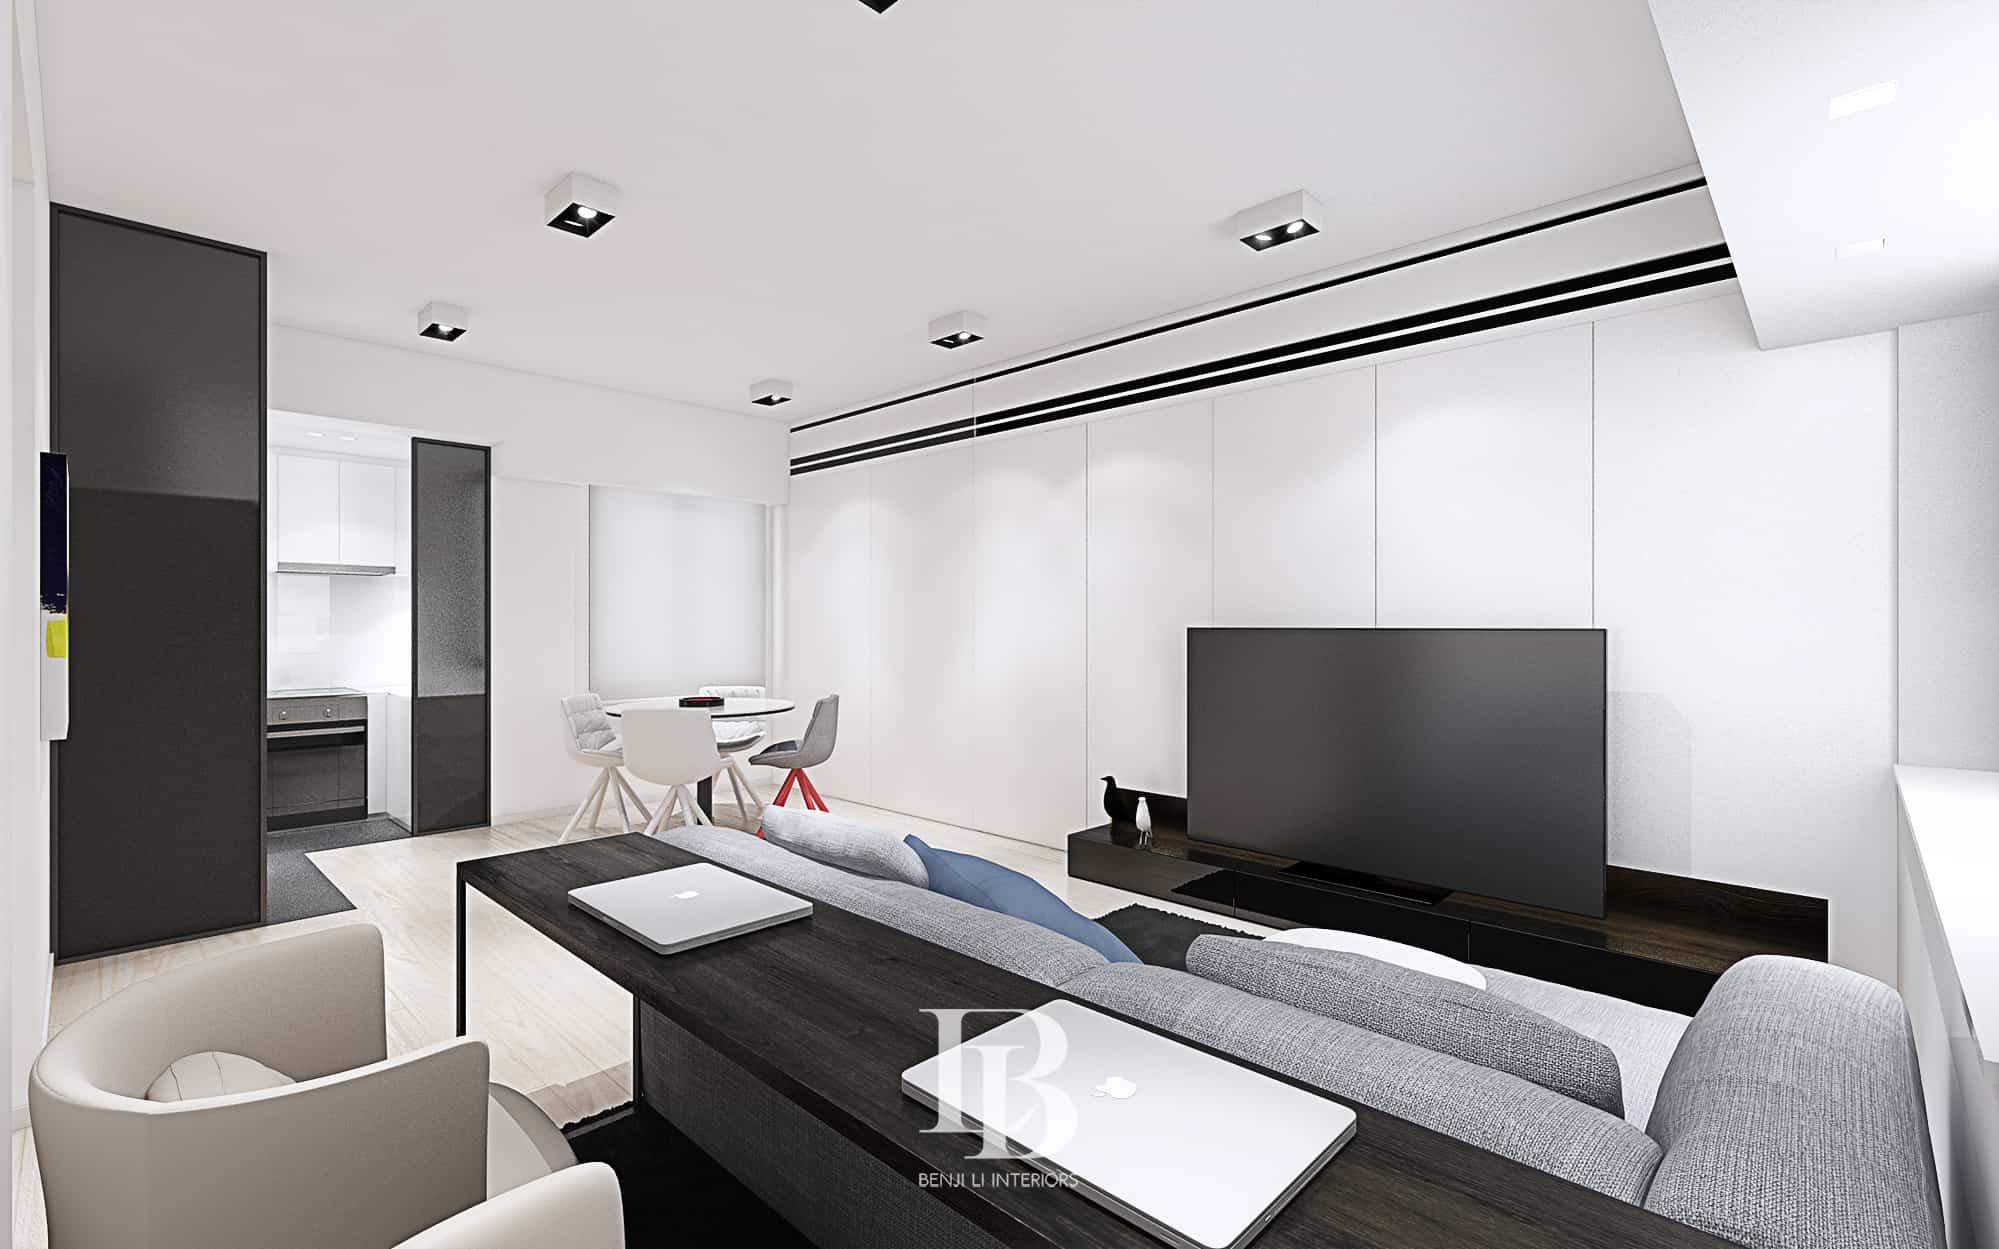 Benji Li Robinson Heights Living Area Dining Area